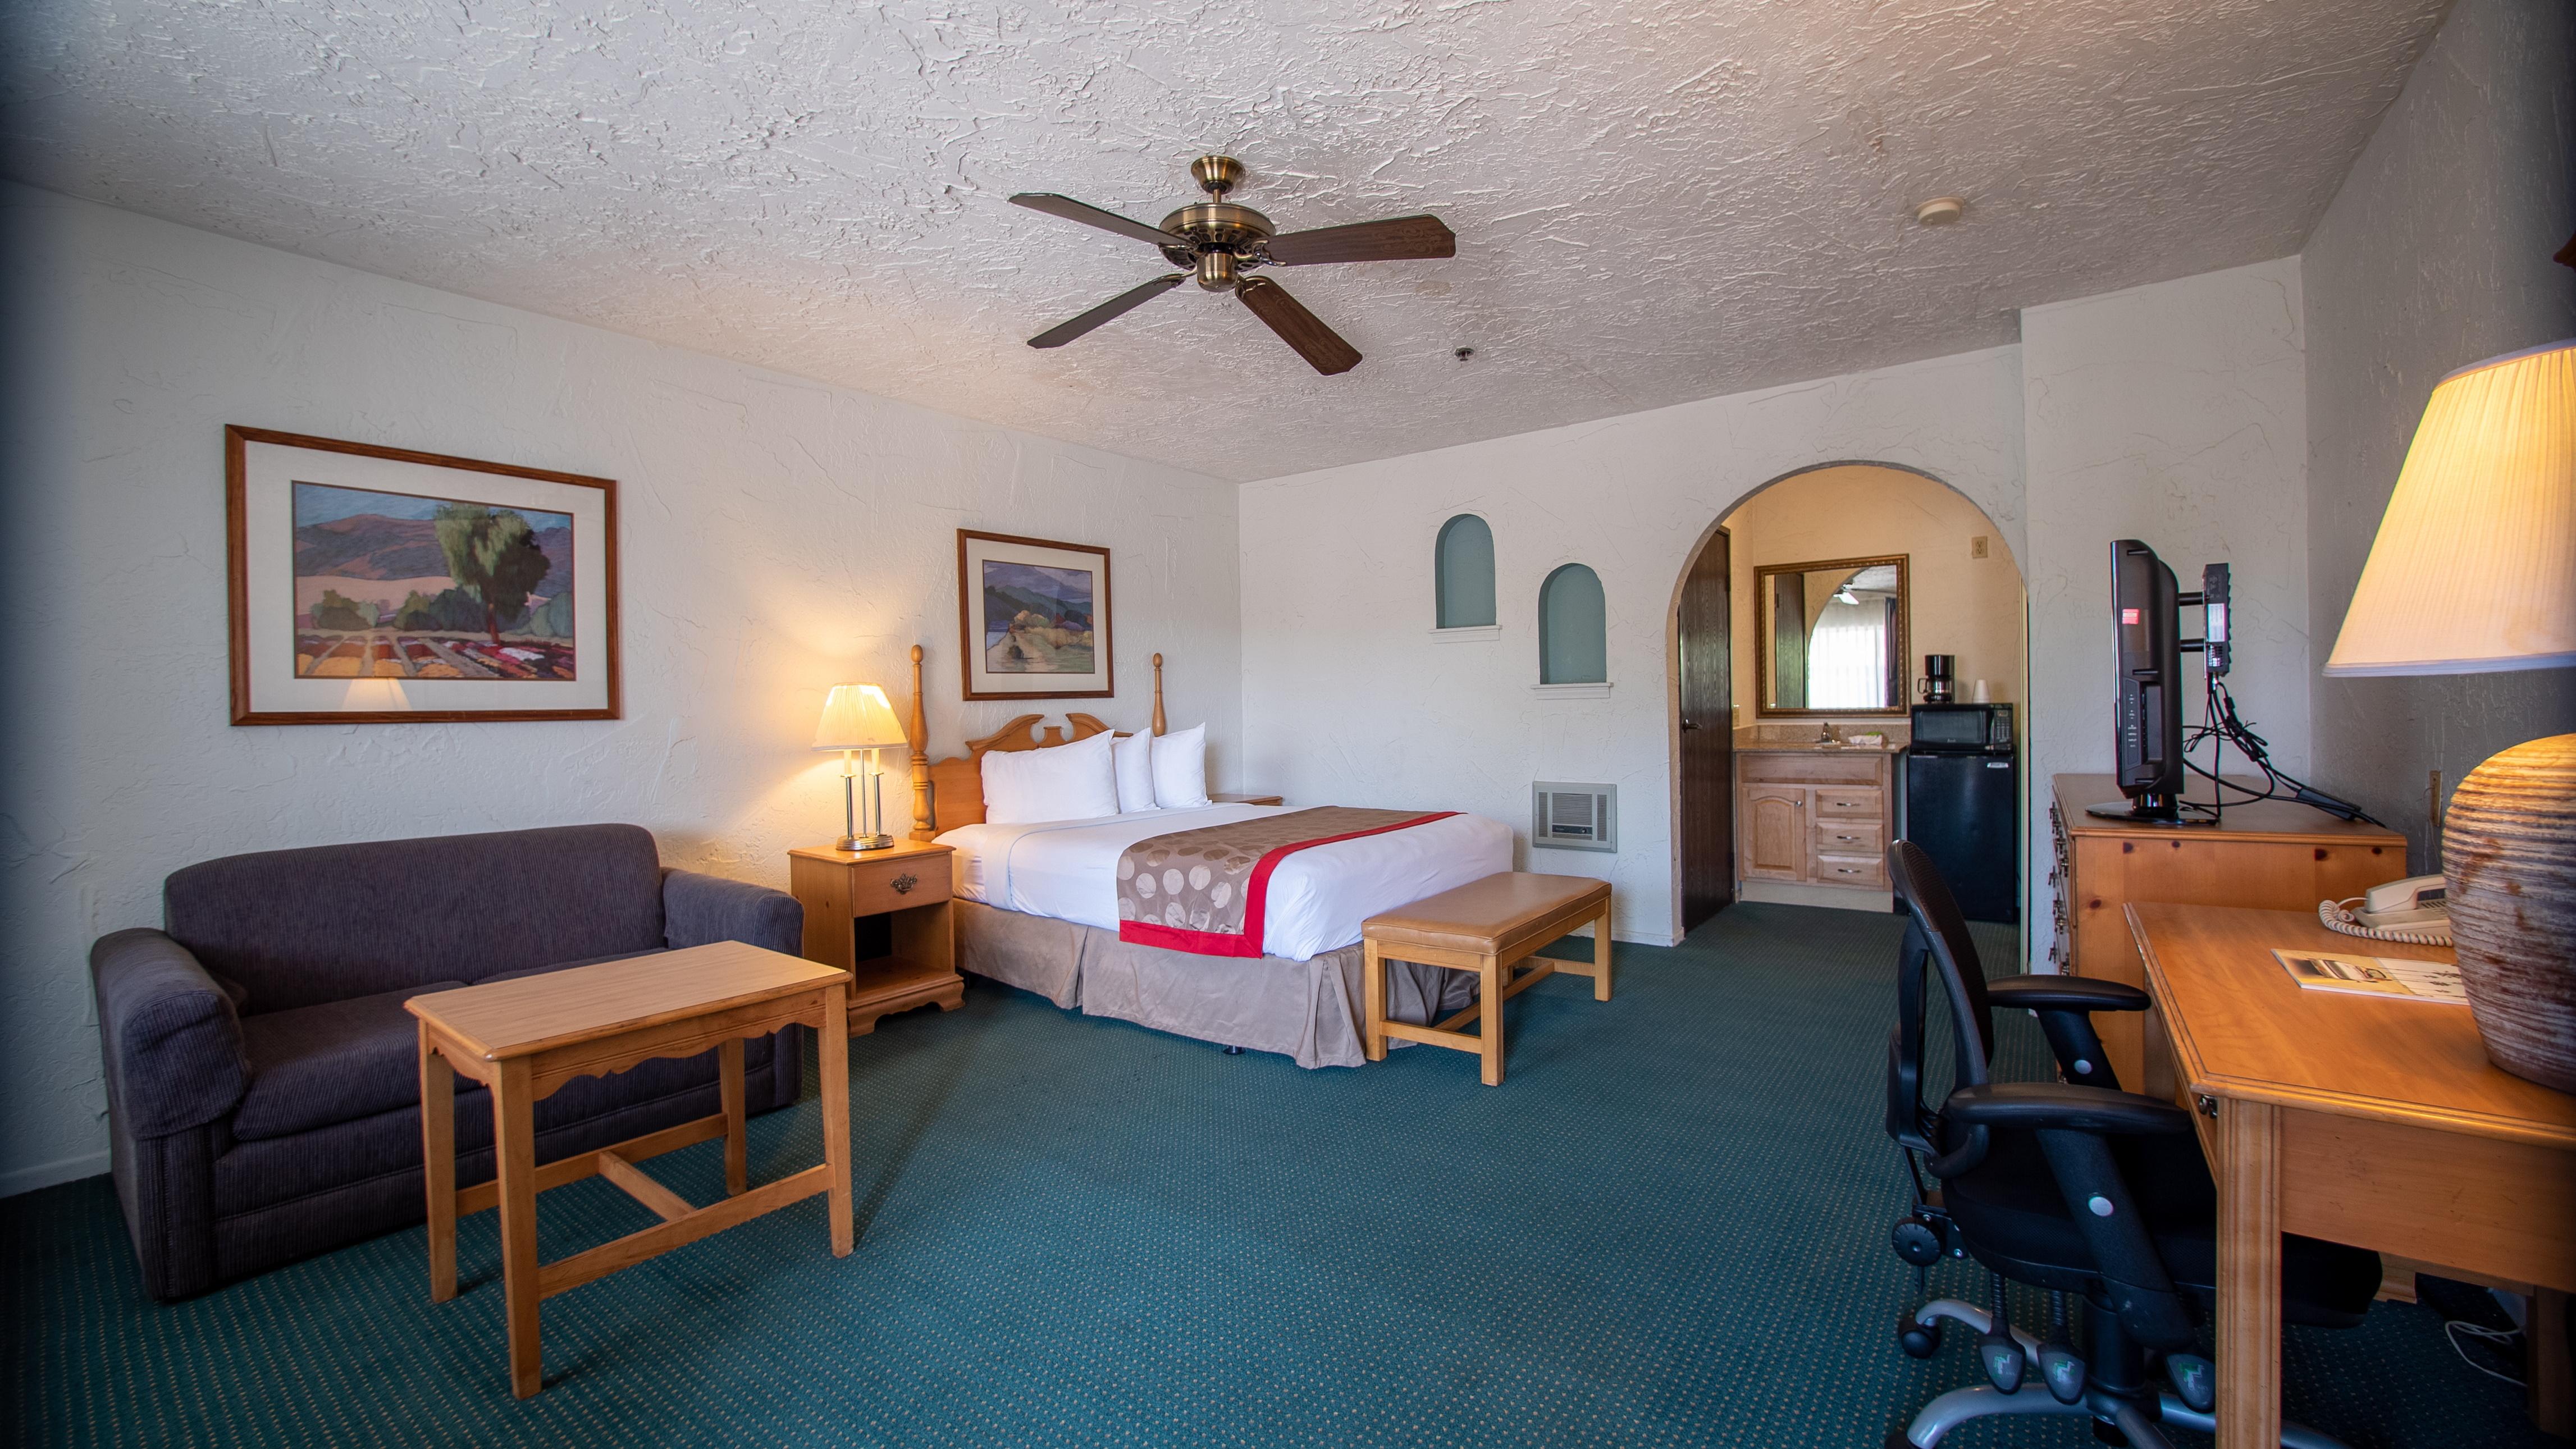 Channel Islands Inn & Suites